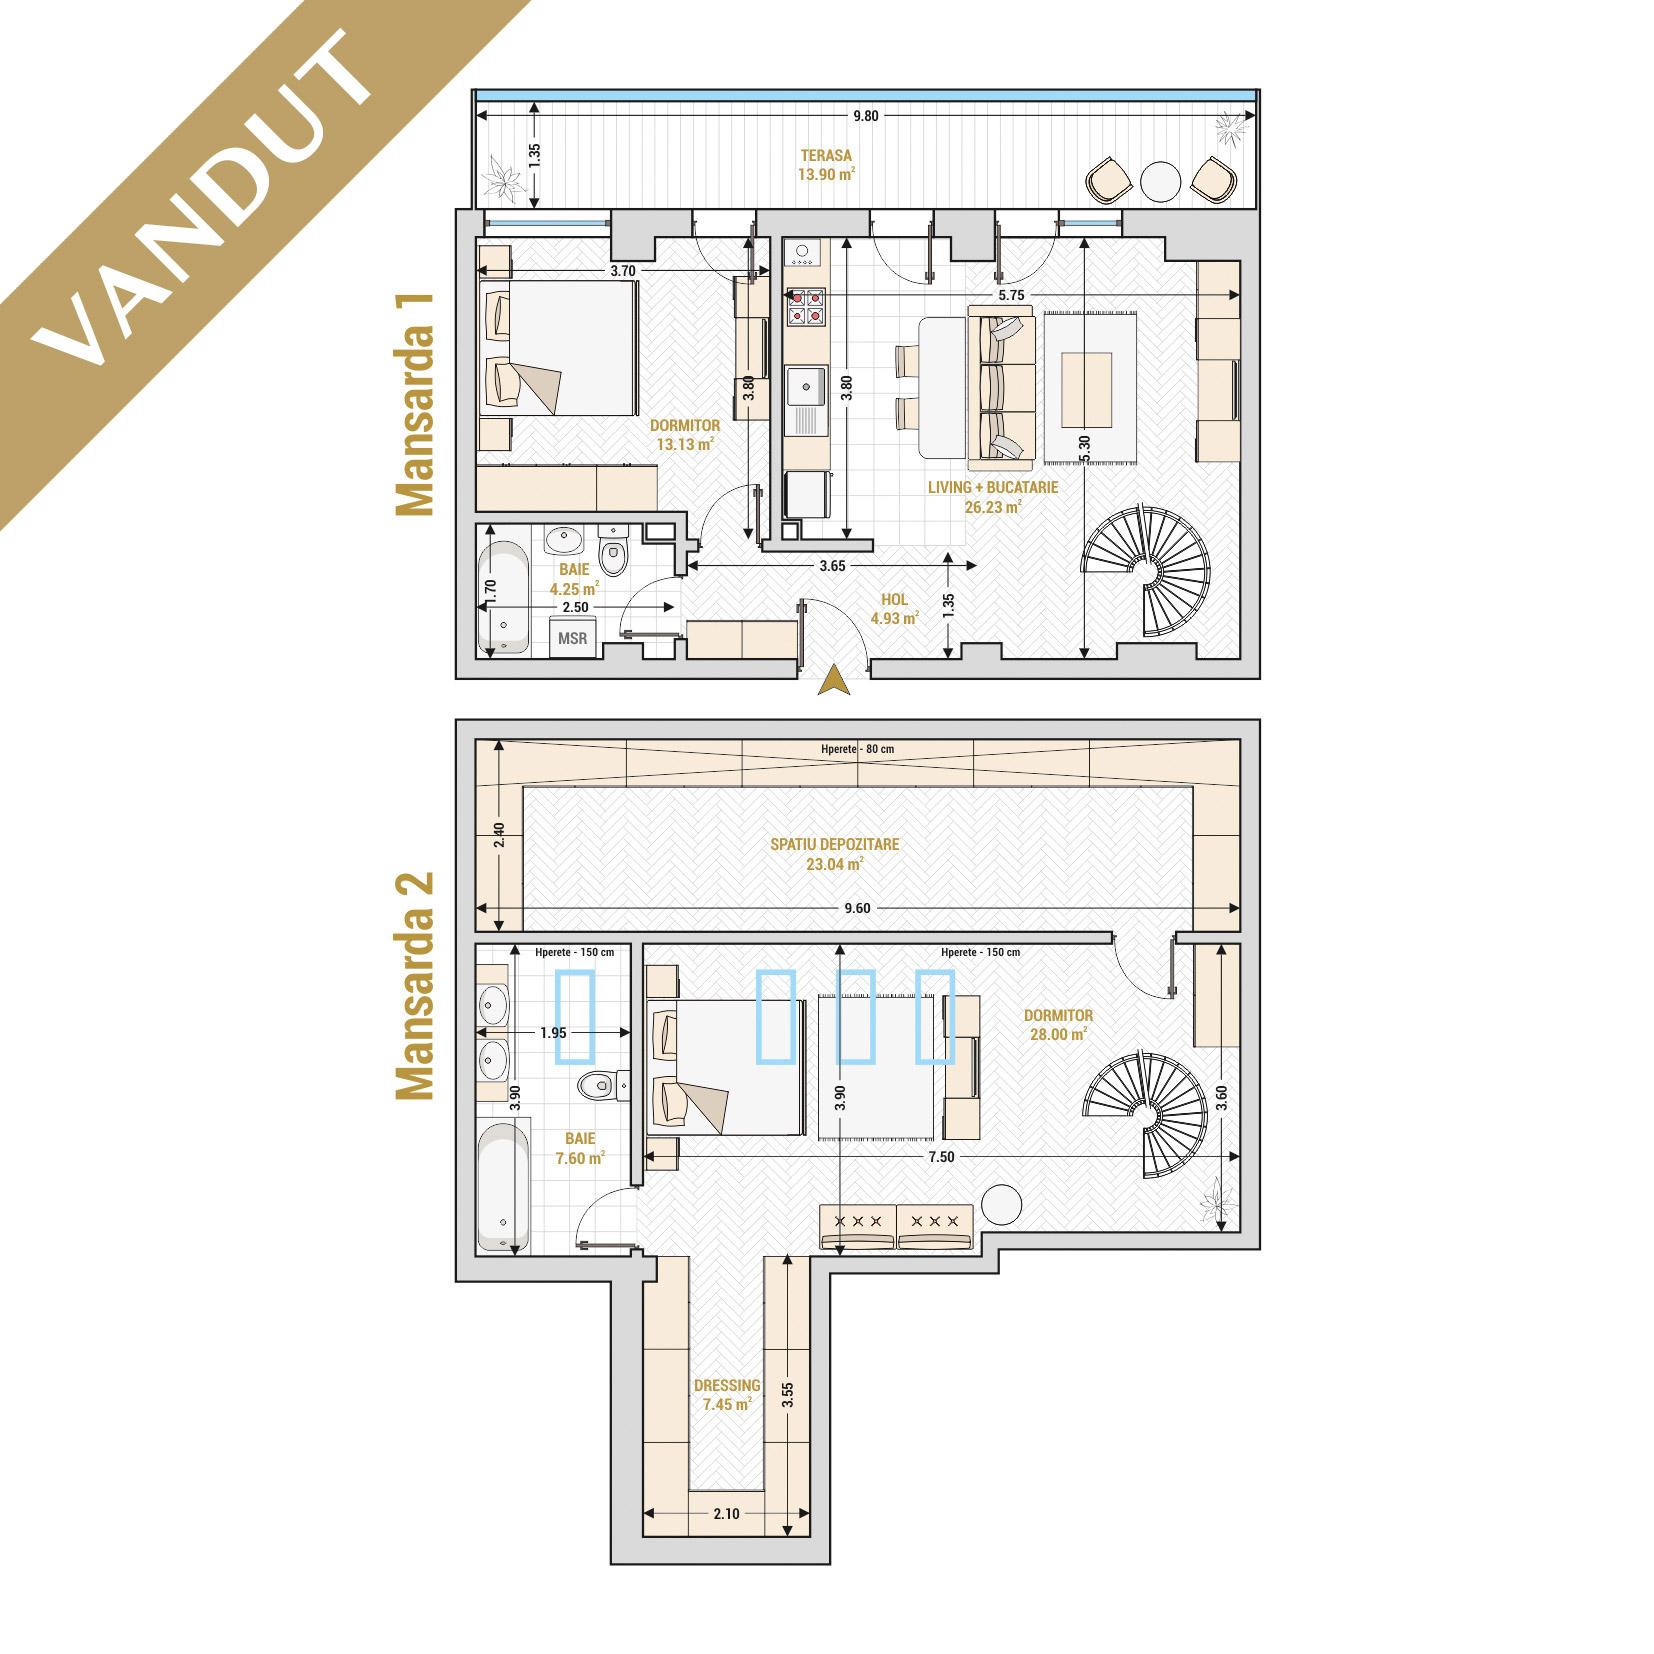 Duplex 3 camere de vanzare Bucuresti - Catedral Residence - Marriott, Piata Unirii, 13 Septembrie, Izvor - T2A - V